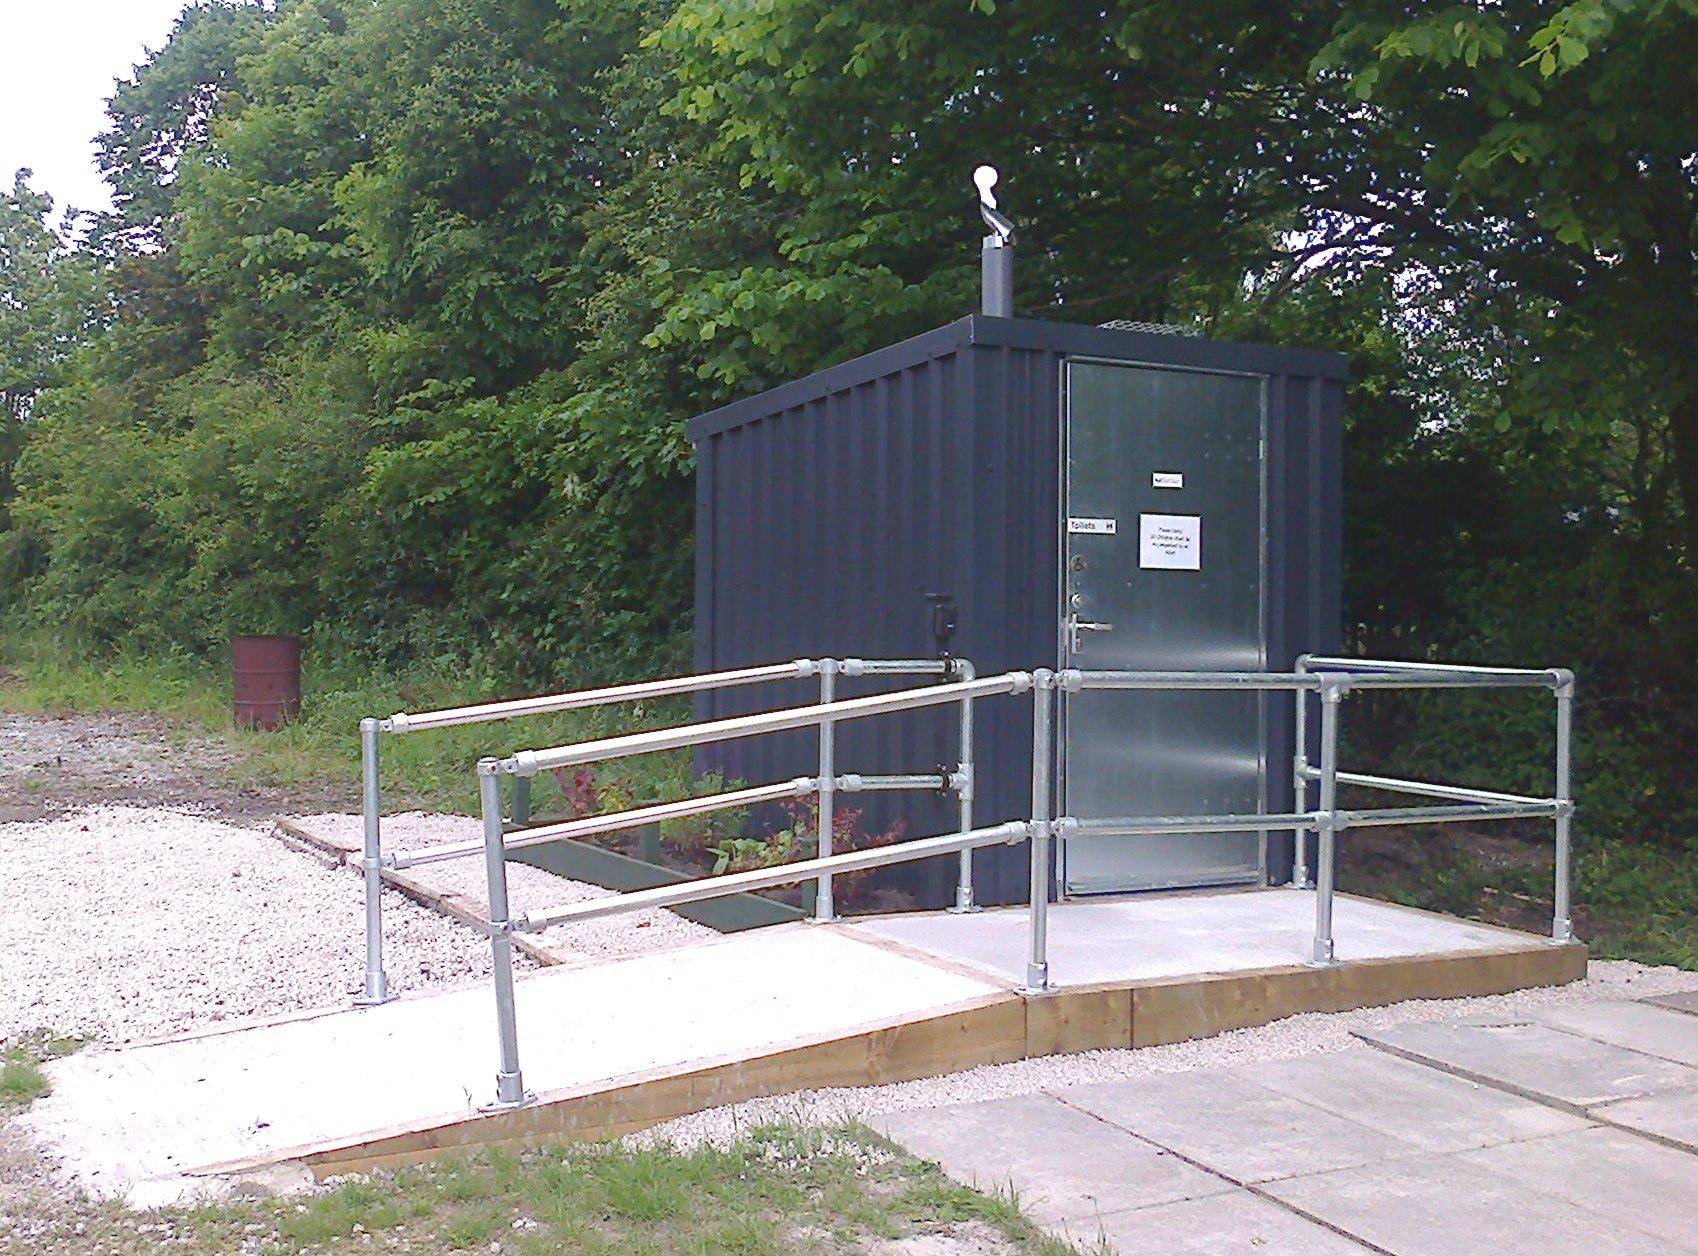 Bowring Park Allotment toilet